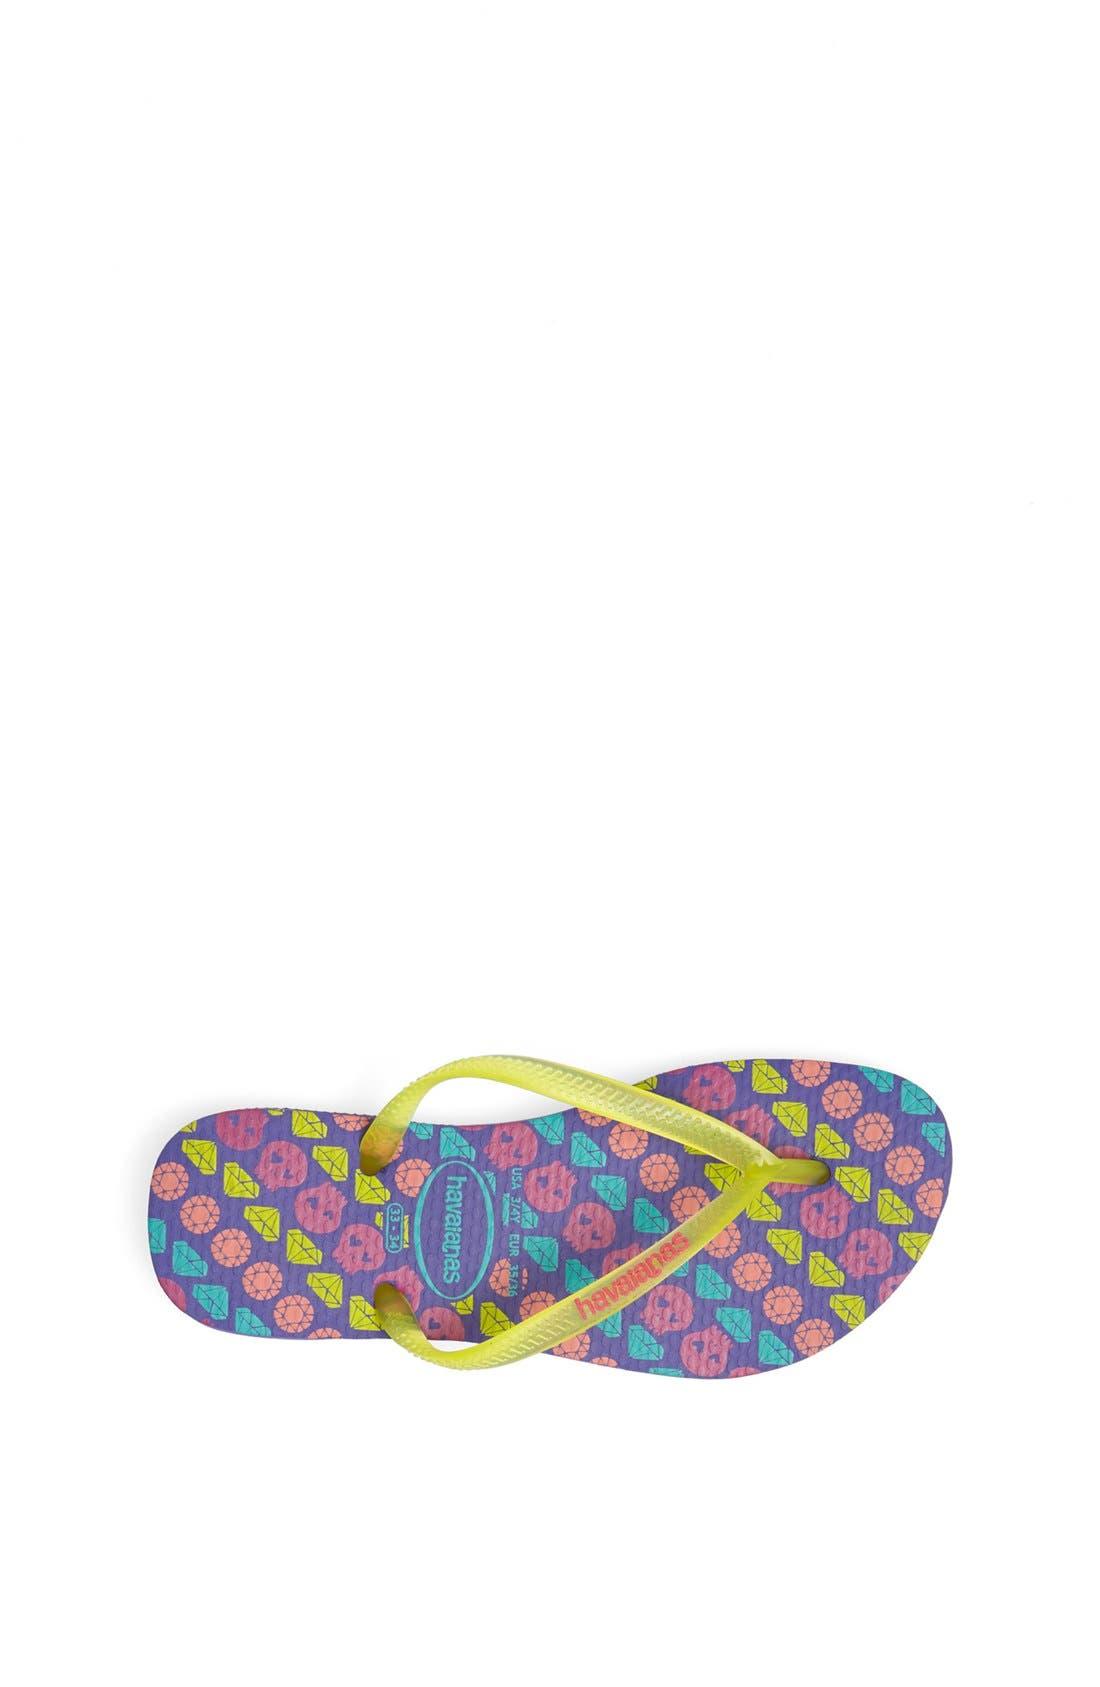 Alternate Image 3  - Havaianas 'Slim' Printed Flip-Flop (Toddler & Little Kid)